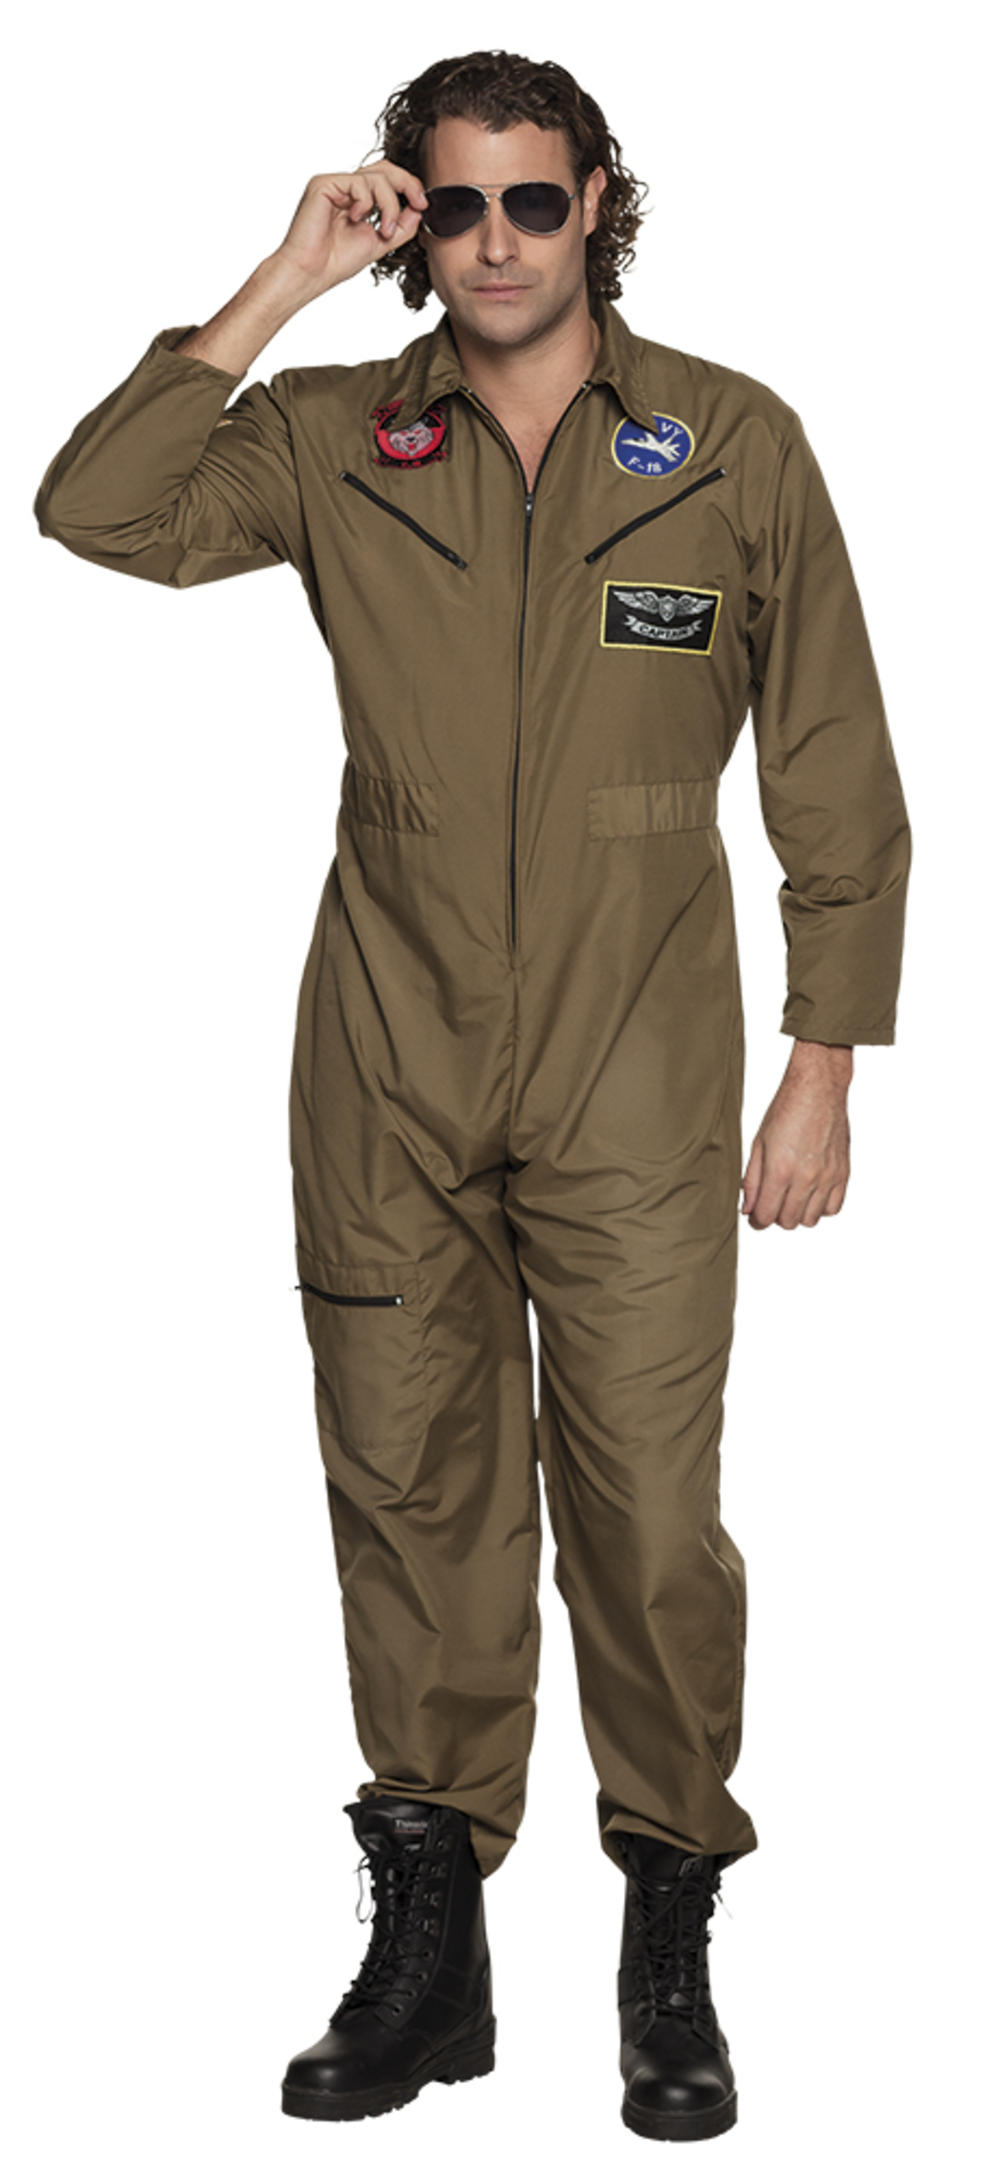 Jet Pilot Mens Fancy Dress Army Air Force Military Uniform Adults Costume New